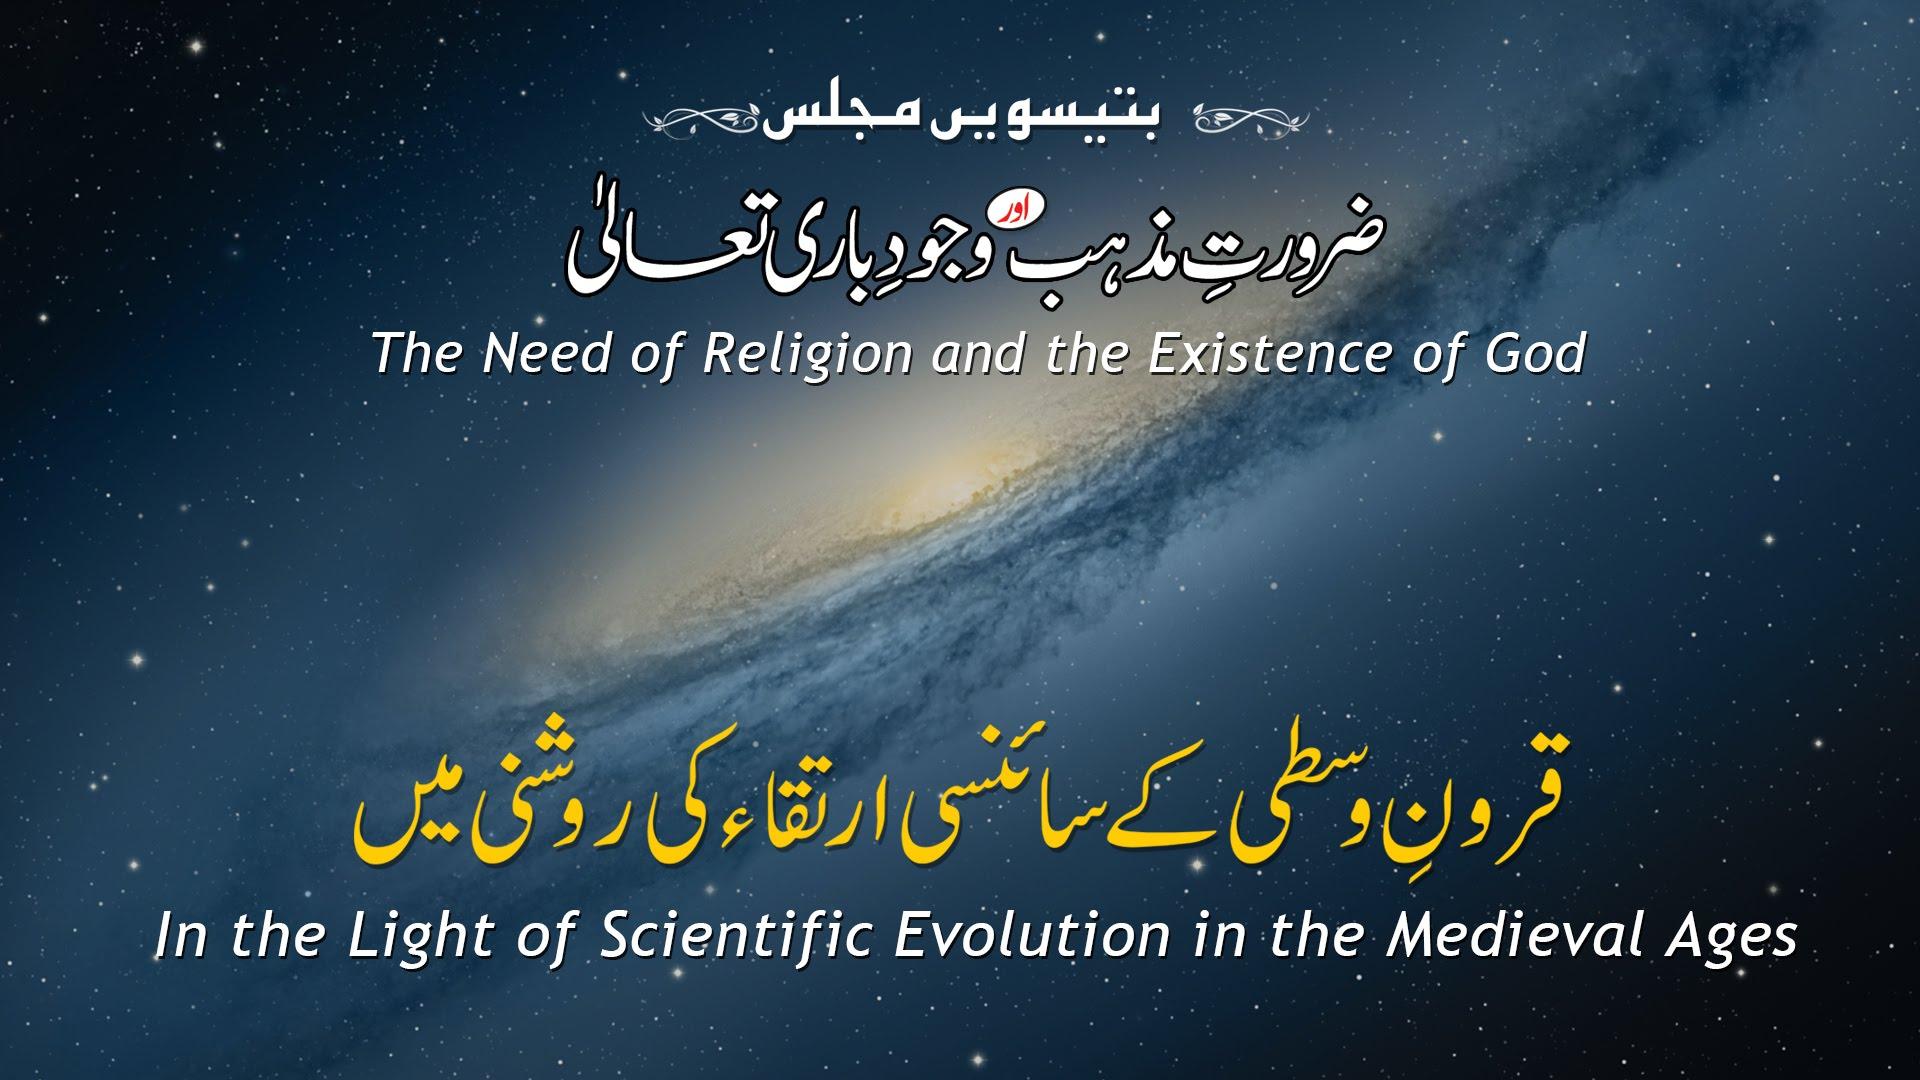 Majalis-ul-ilm (Lecture 32) - by Shaykh-ul-Islam Dr Muhammad Tahir-ul-Qadri